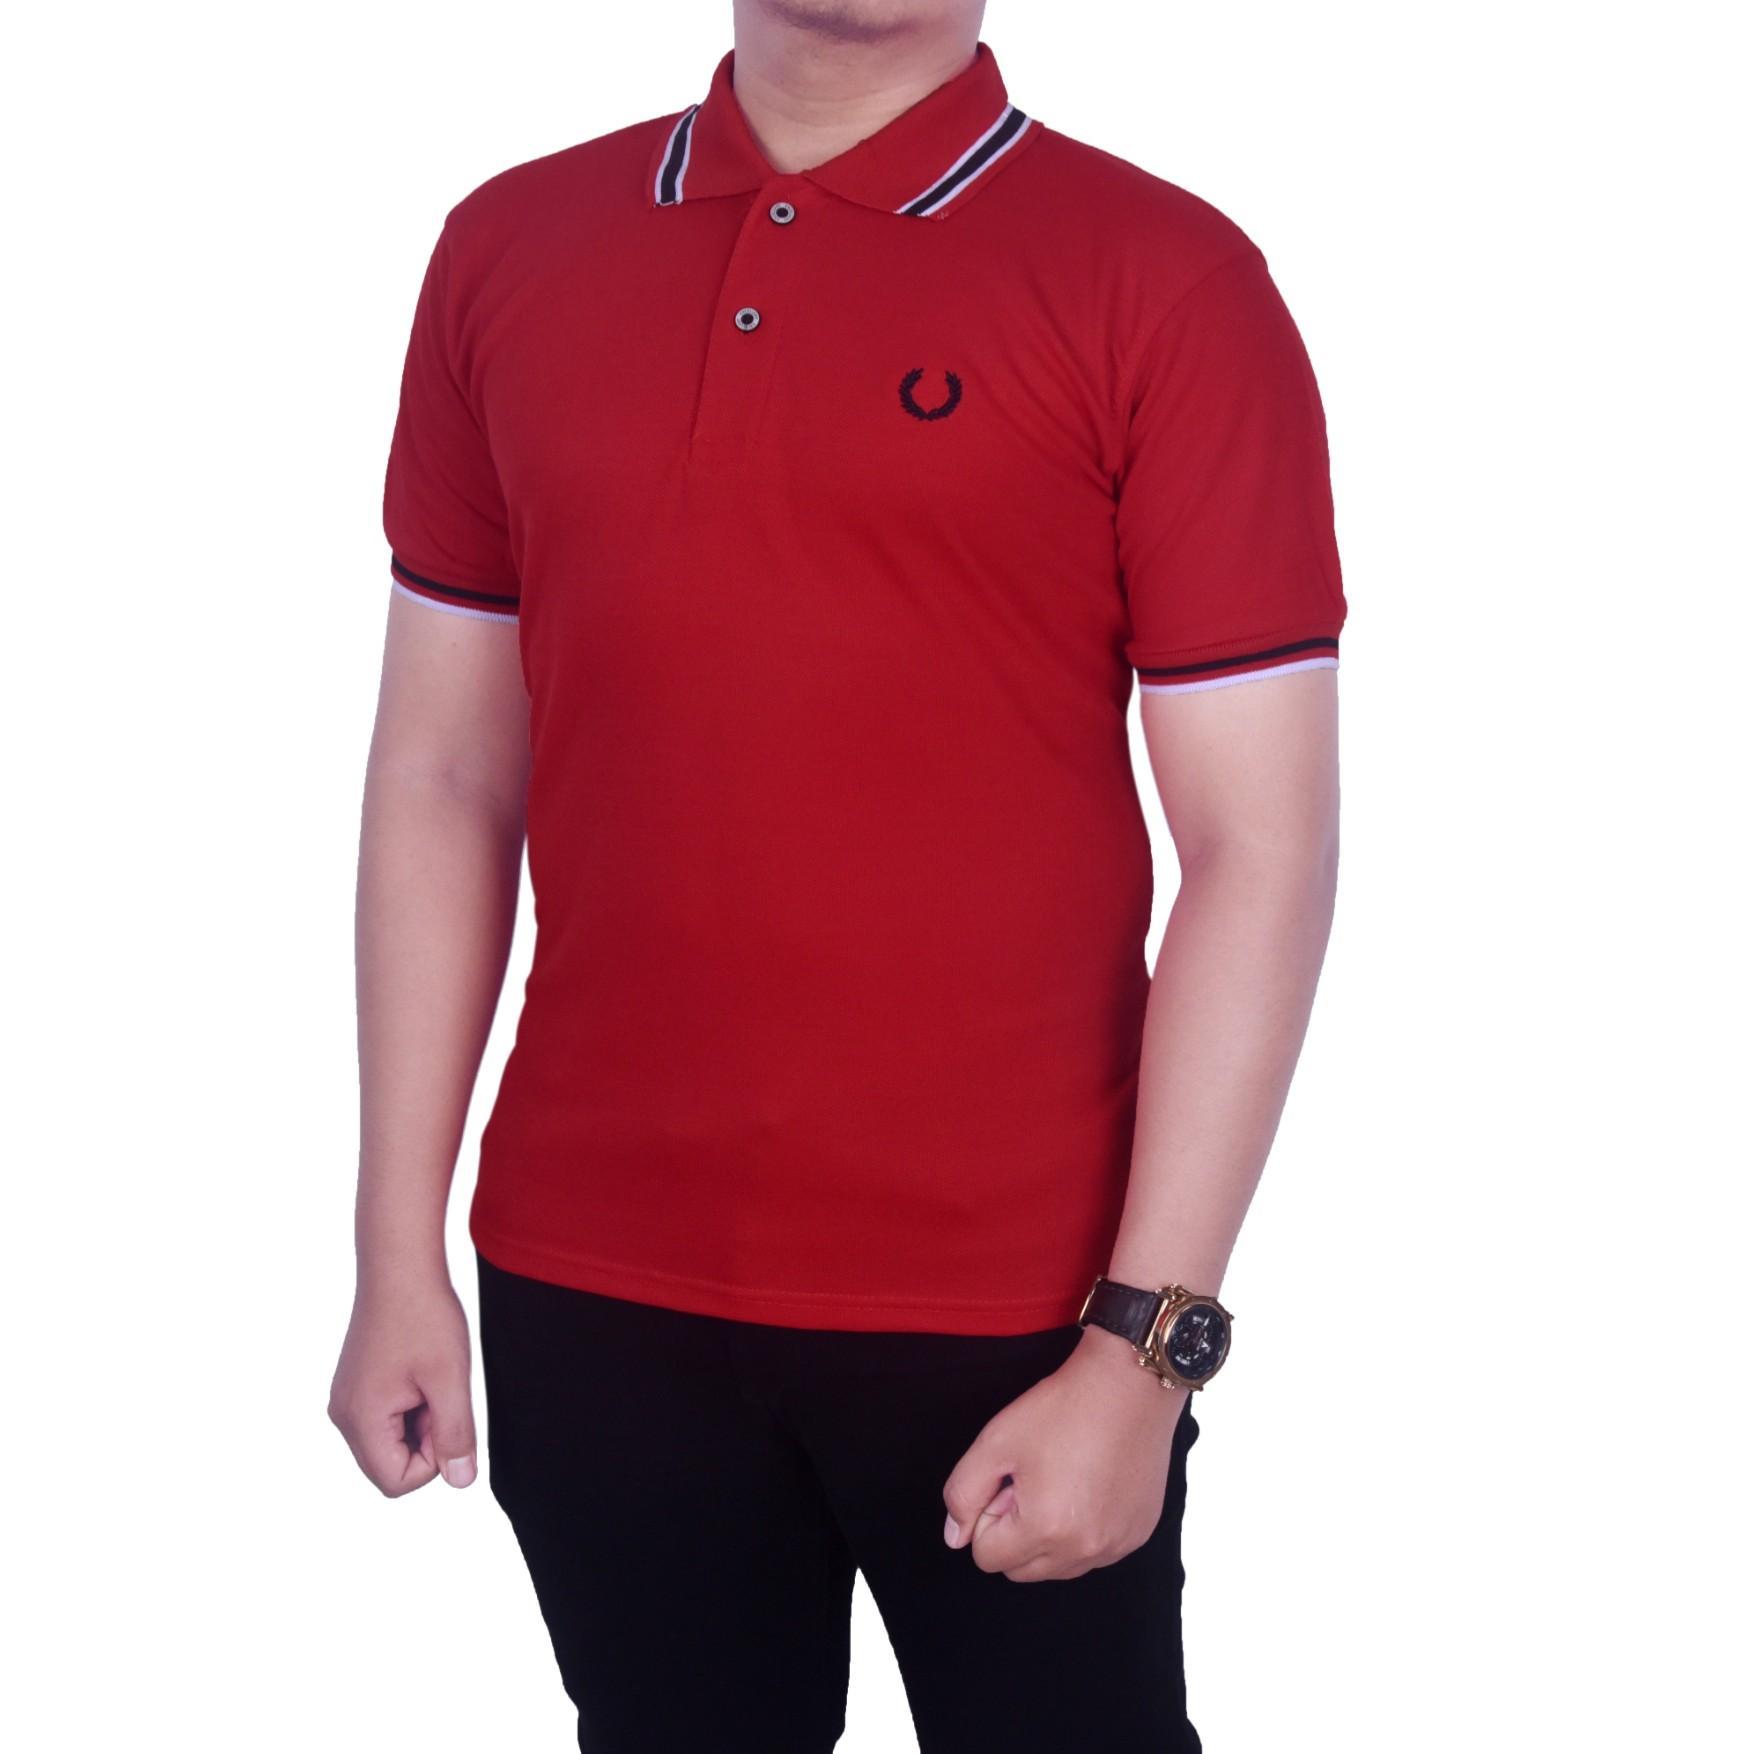 Dgm_Fashion1 Kaos Polo Kerah Polos Merah/ Polo Sanghai/baju kaos pria polos/ polo